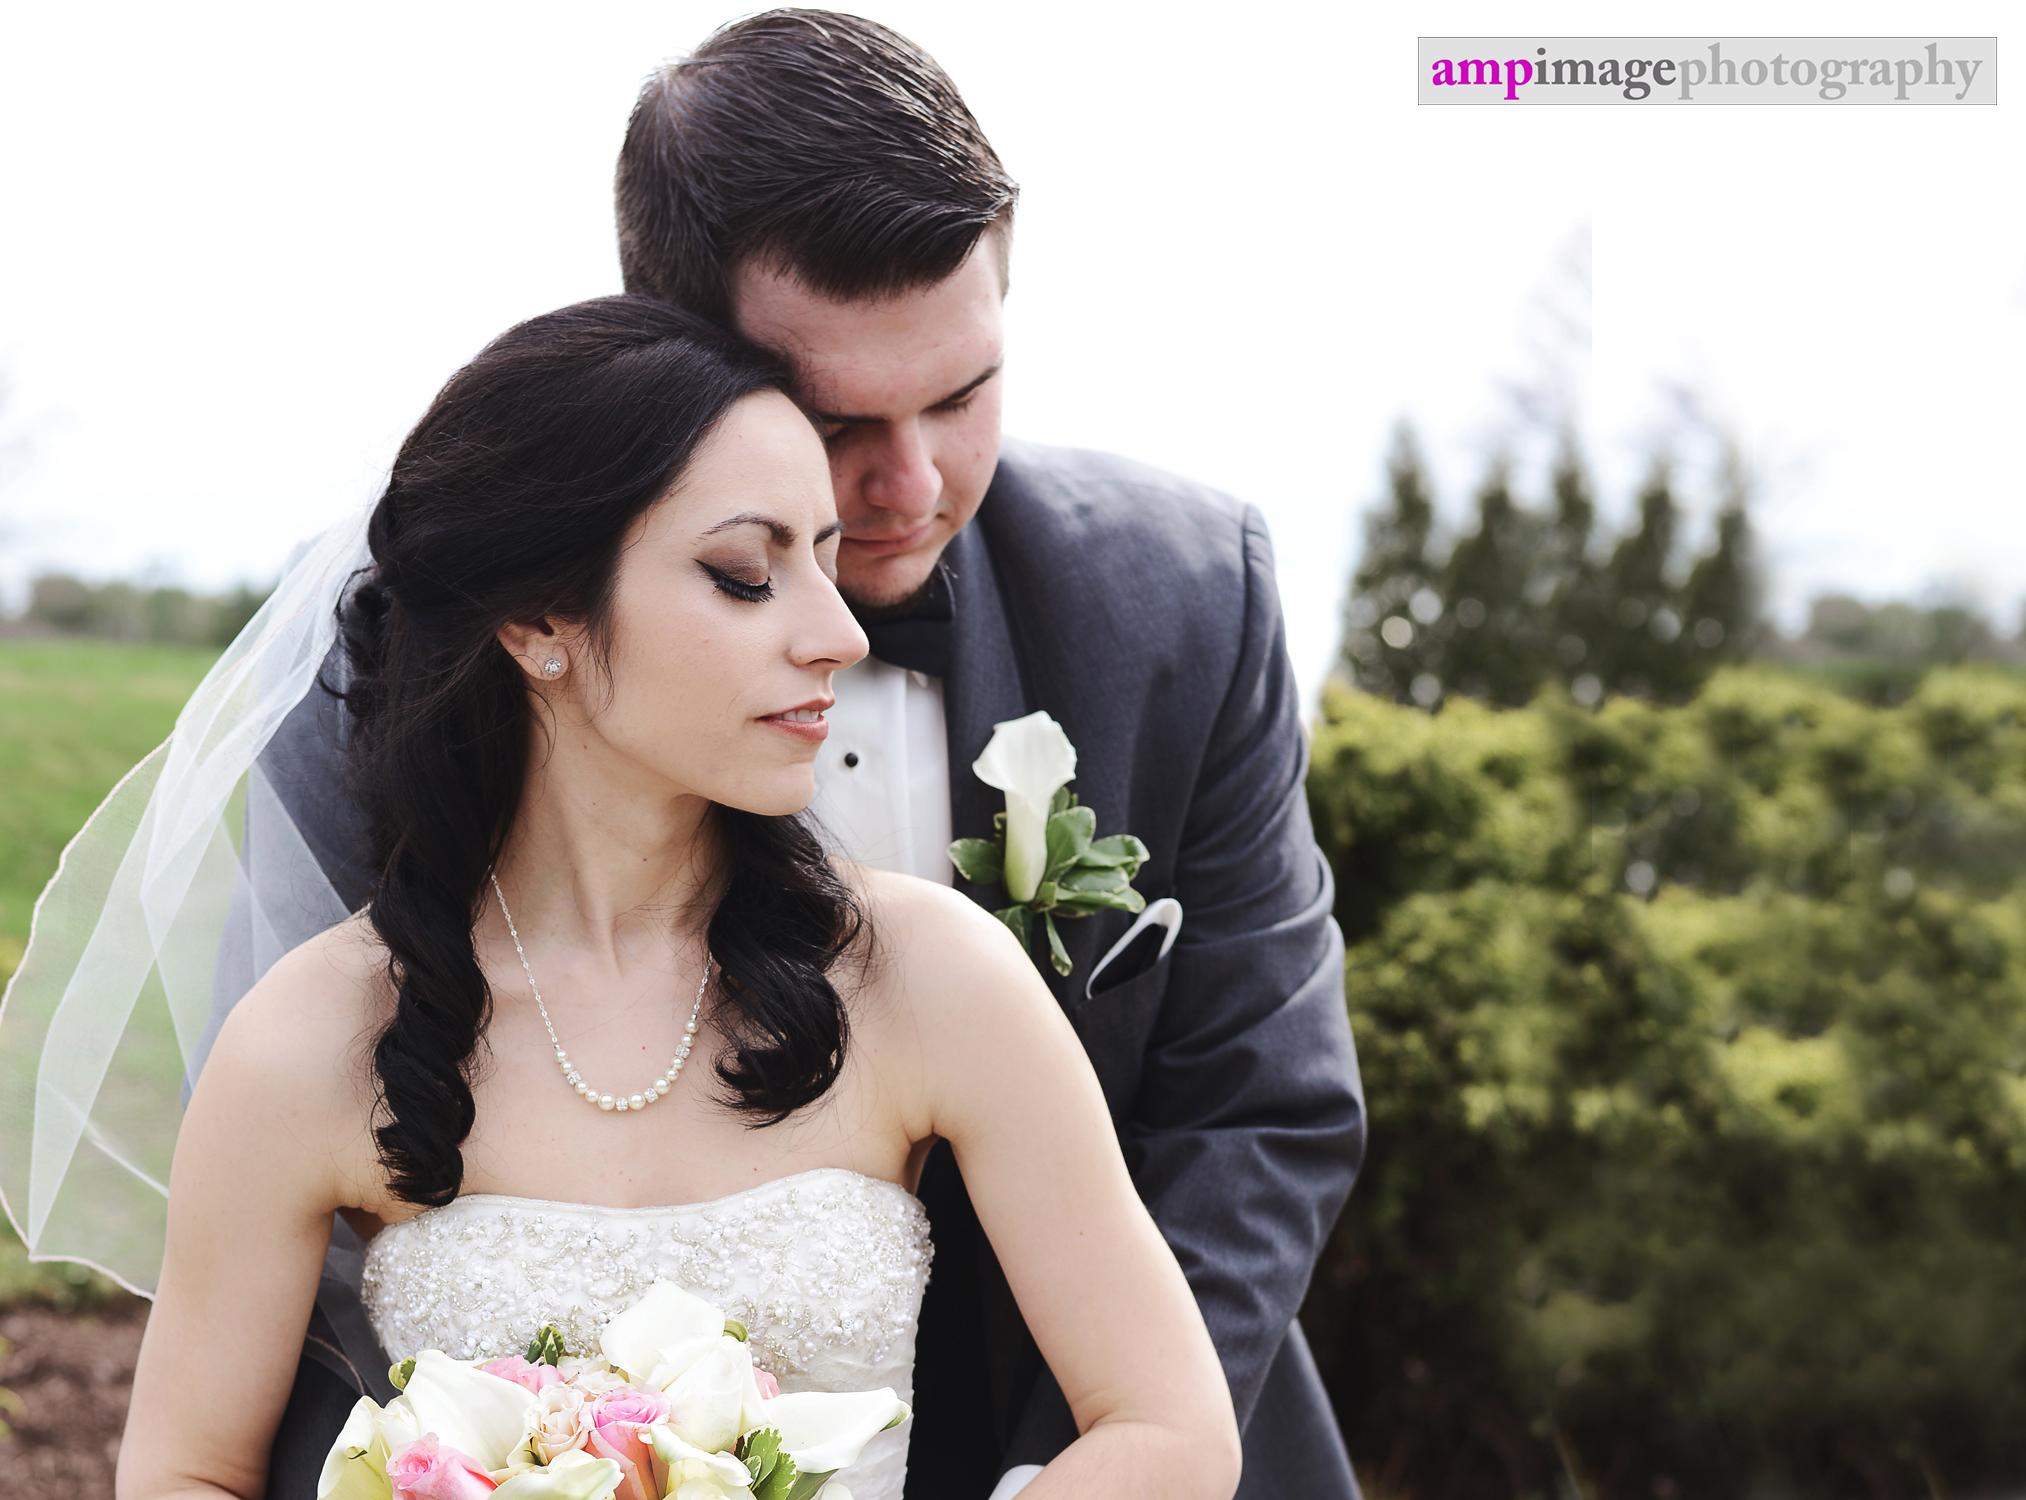 Caroline & Chris | Wedding | The Avalon at Squaw Creek | Sorrento's Banquet Center | Youngstown Wedding Photographer